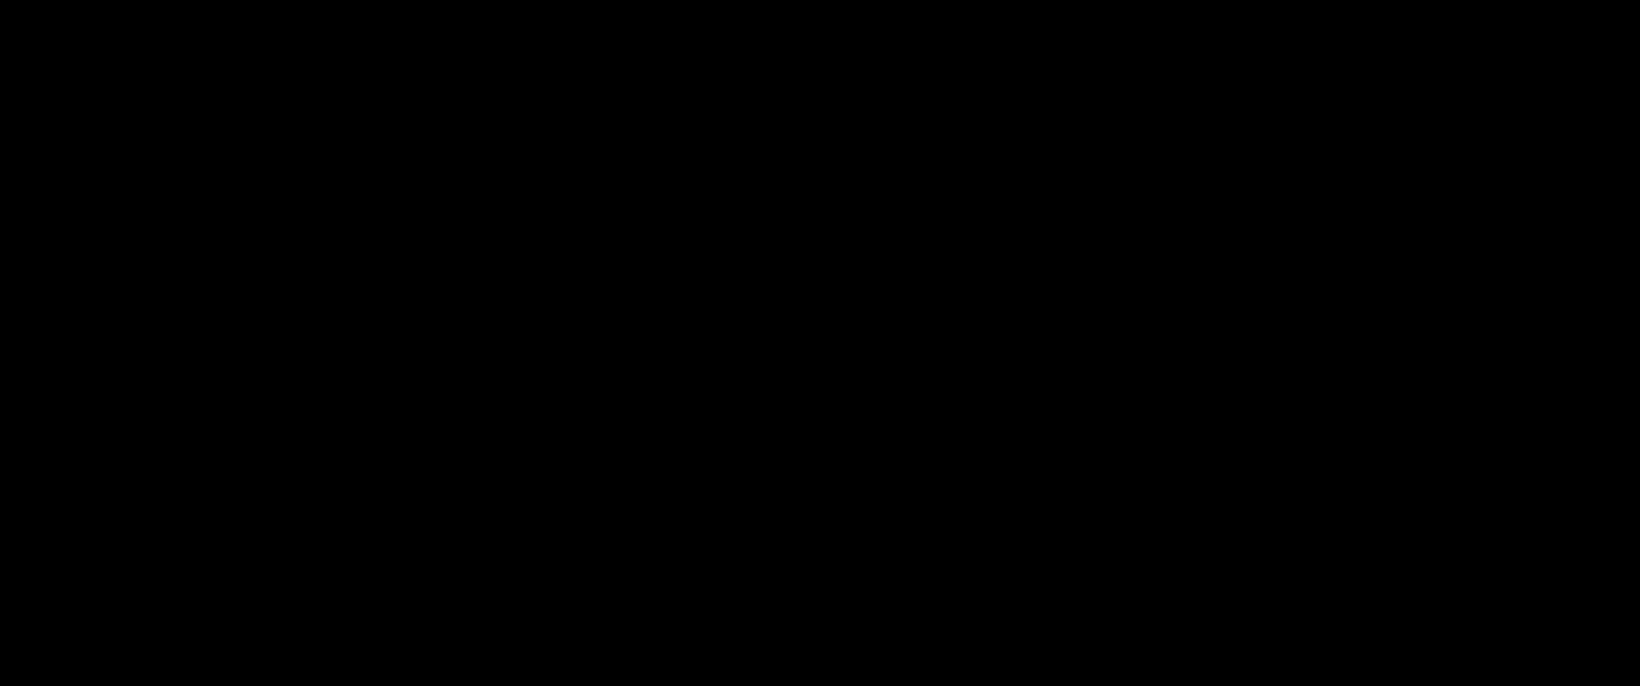 CL-82198 hydrochloride